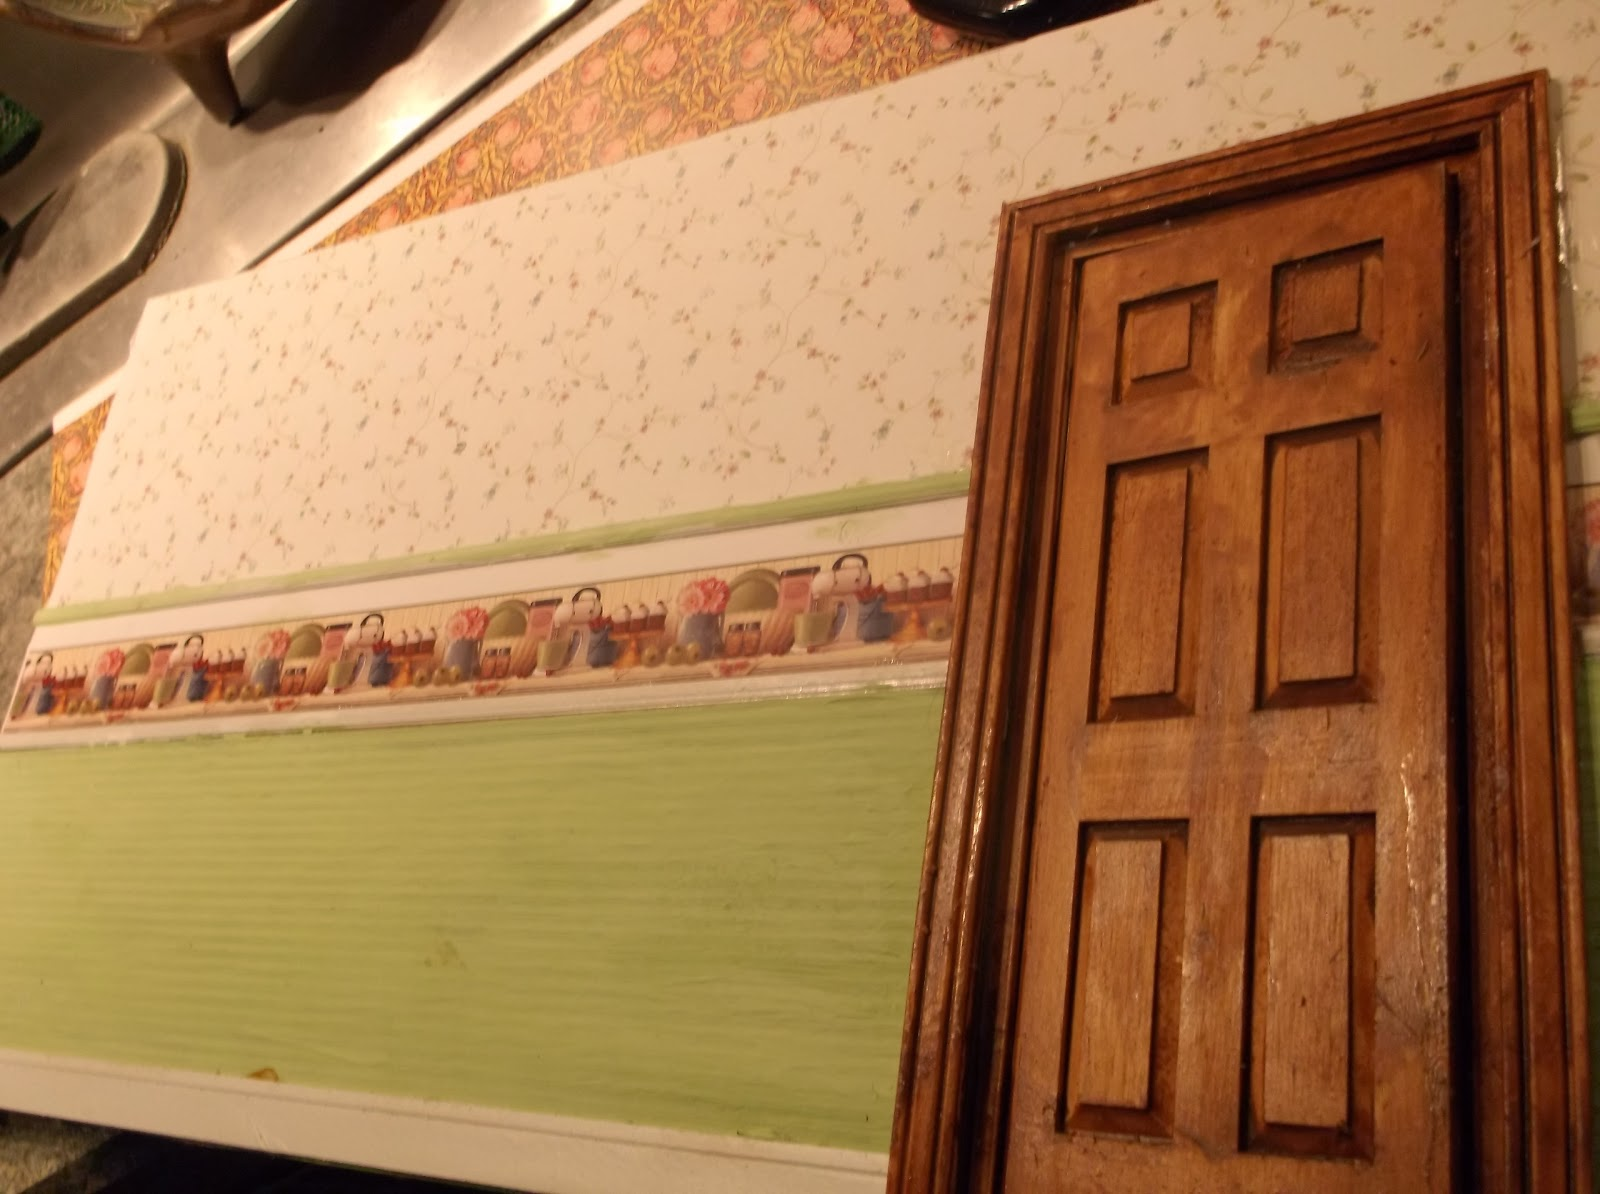 Fantastic Decorative Wood Wall Borders Photos - The Wall Art ...